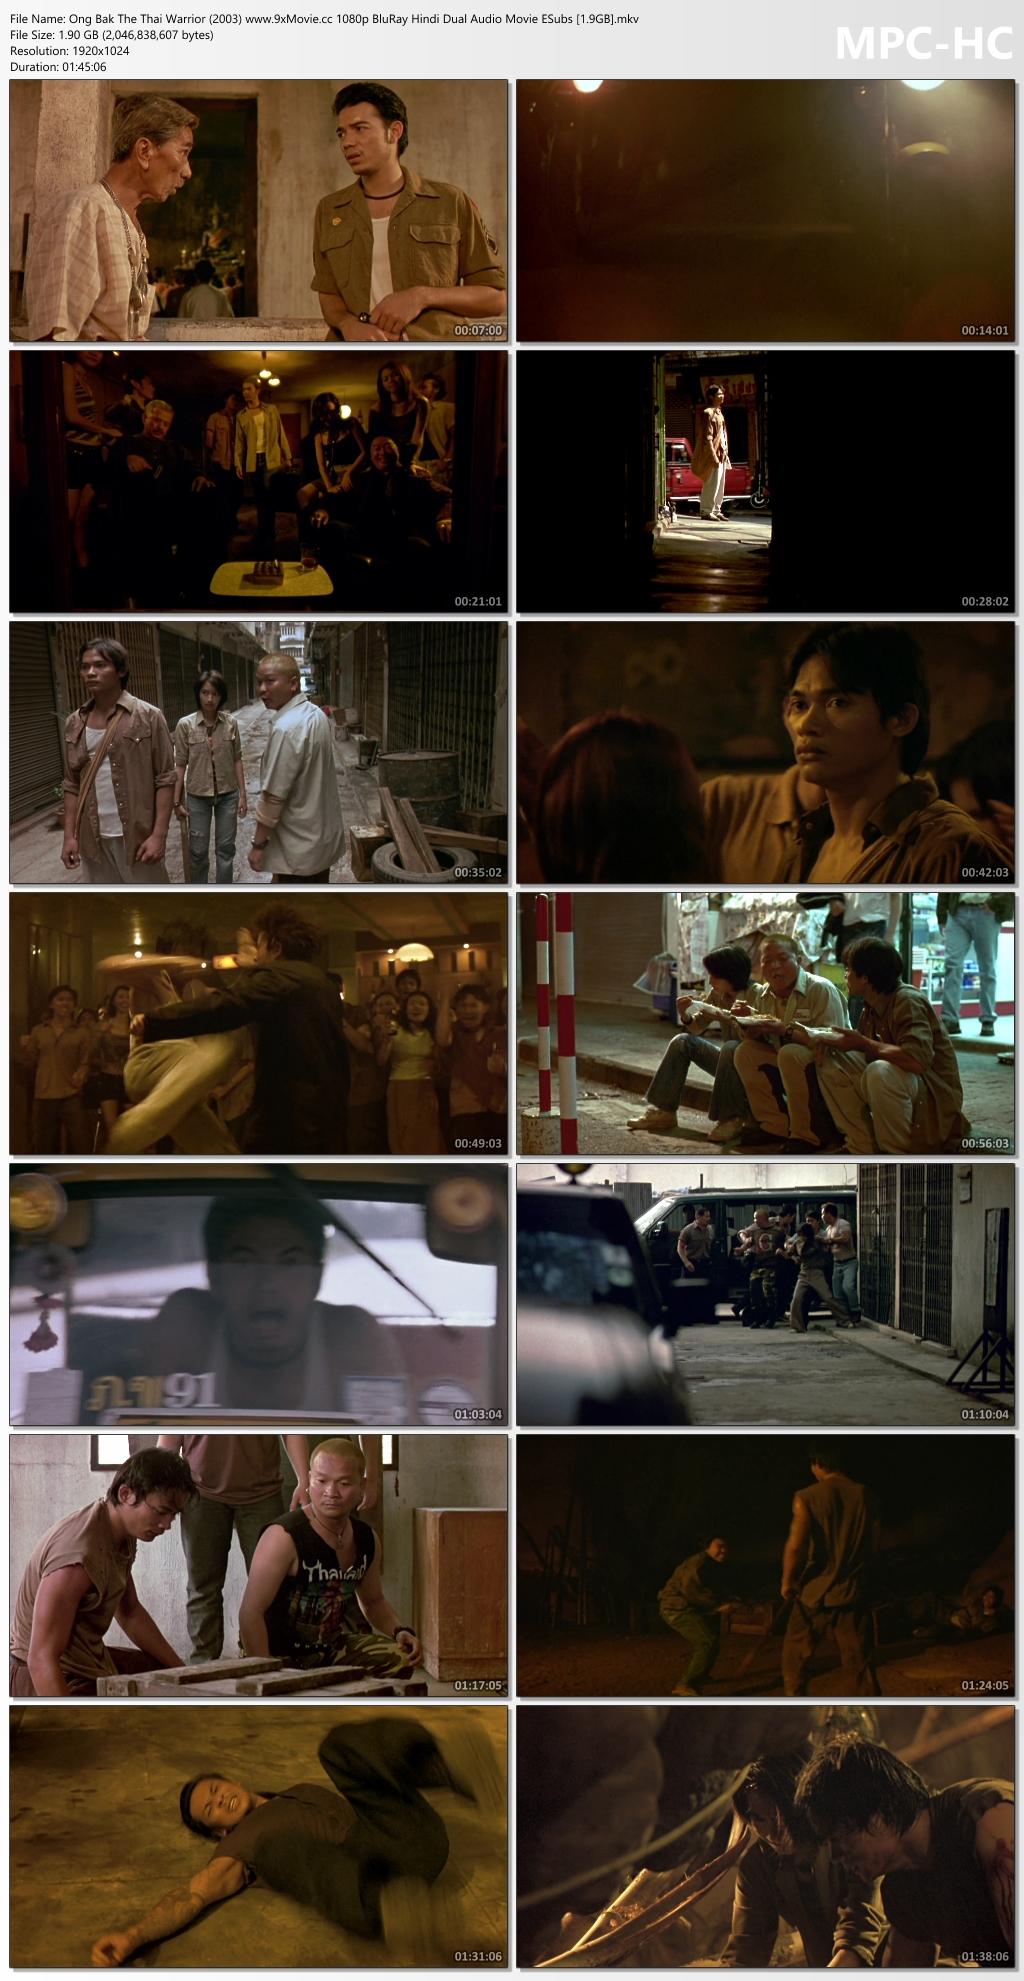 Ong-Bak-The-Thai-Warrior-2003-www-9x-Movie-cc-1080p-Blu-Ray-Hindi-Dual-Audio-Movie-ESubs-1-9-GB-mkv